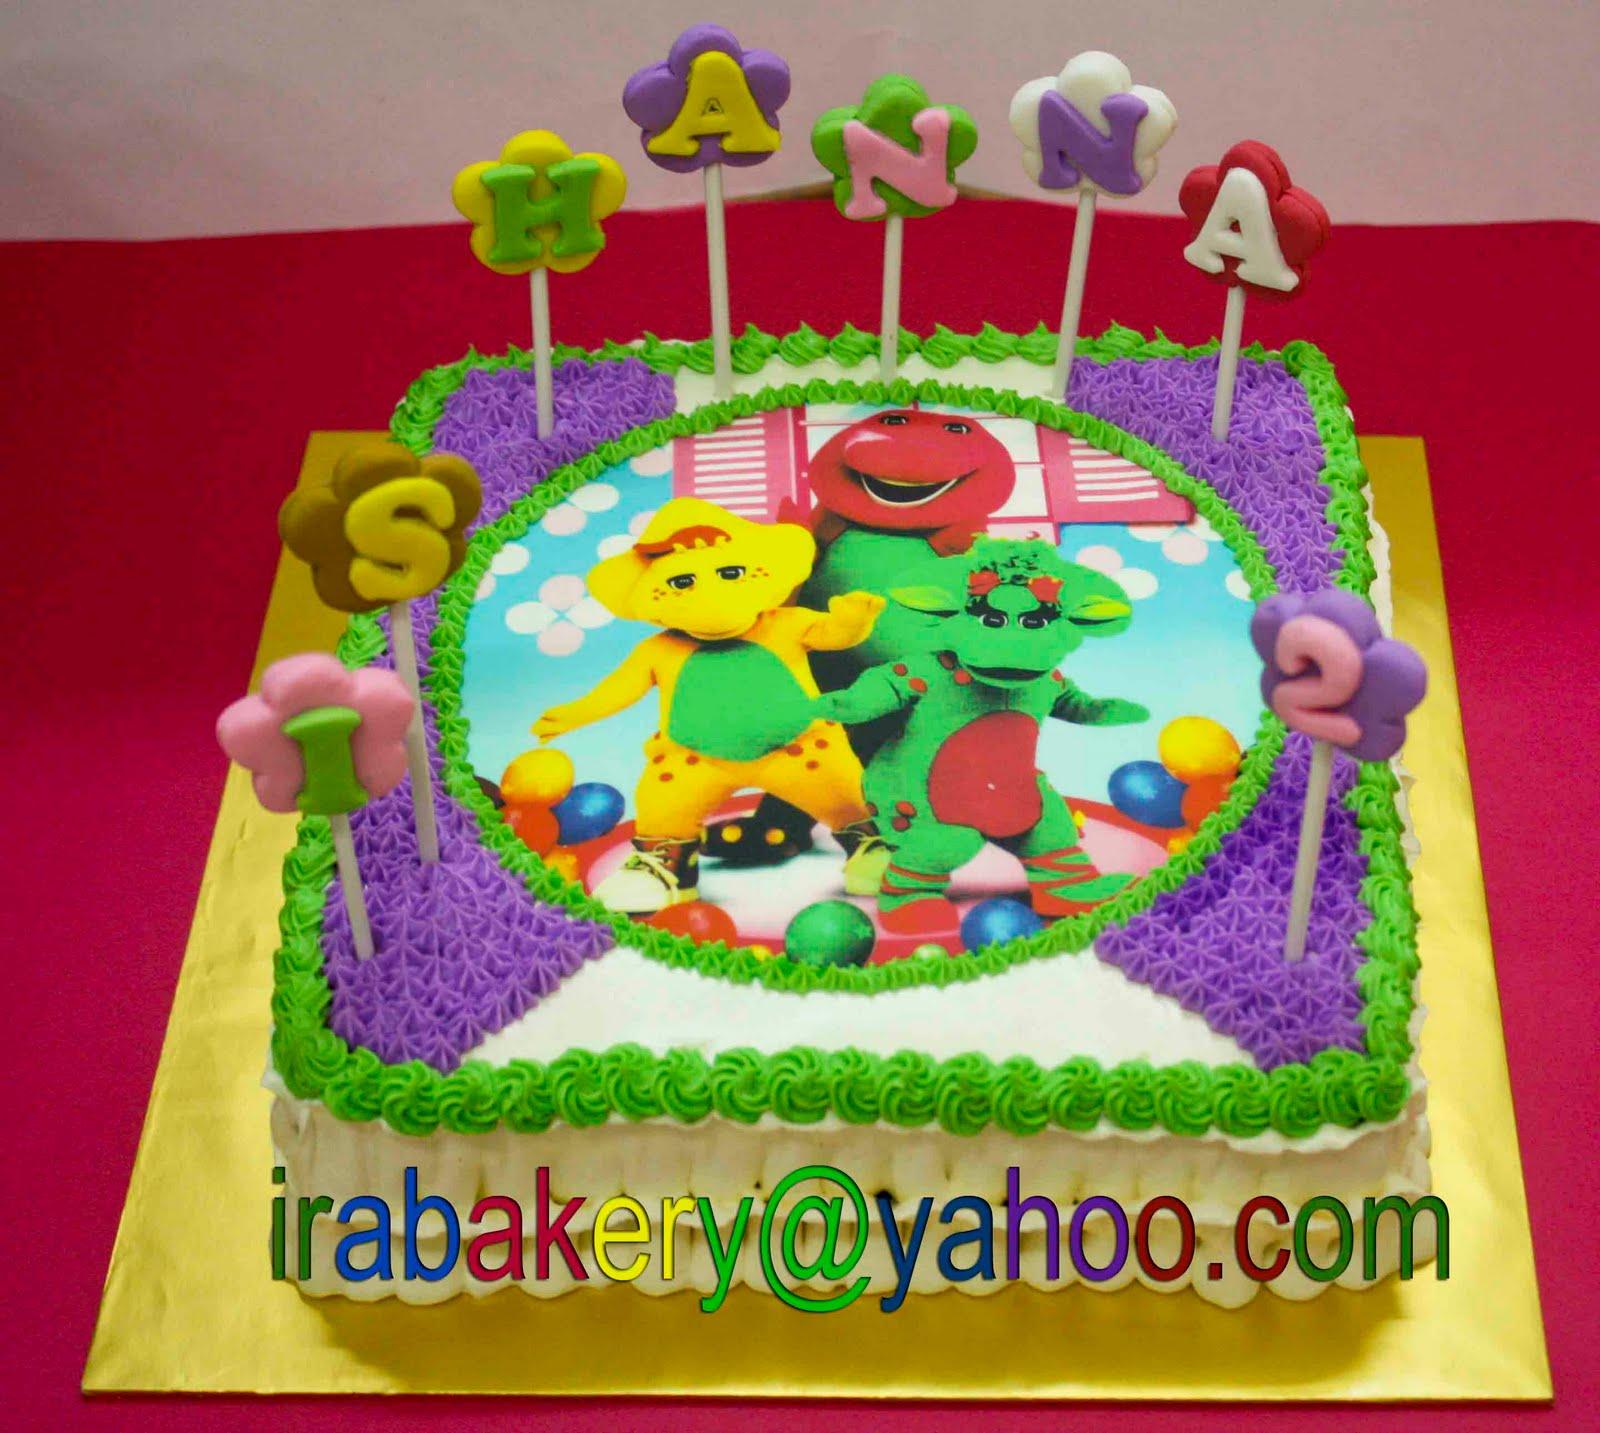 barney cake - photo #18